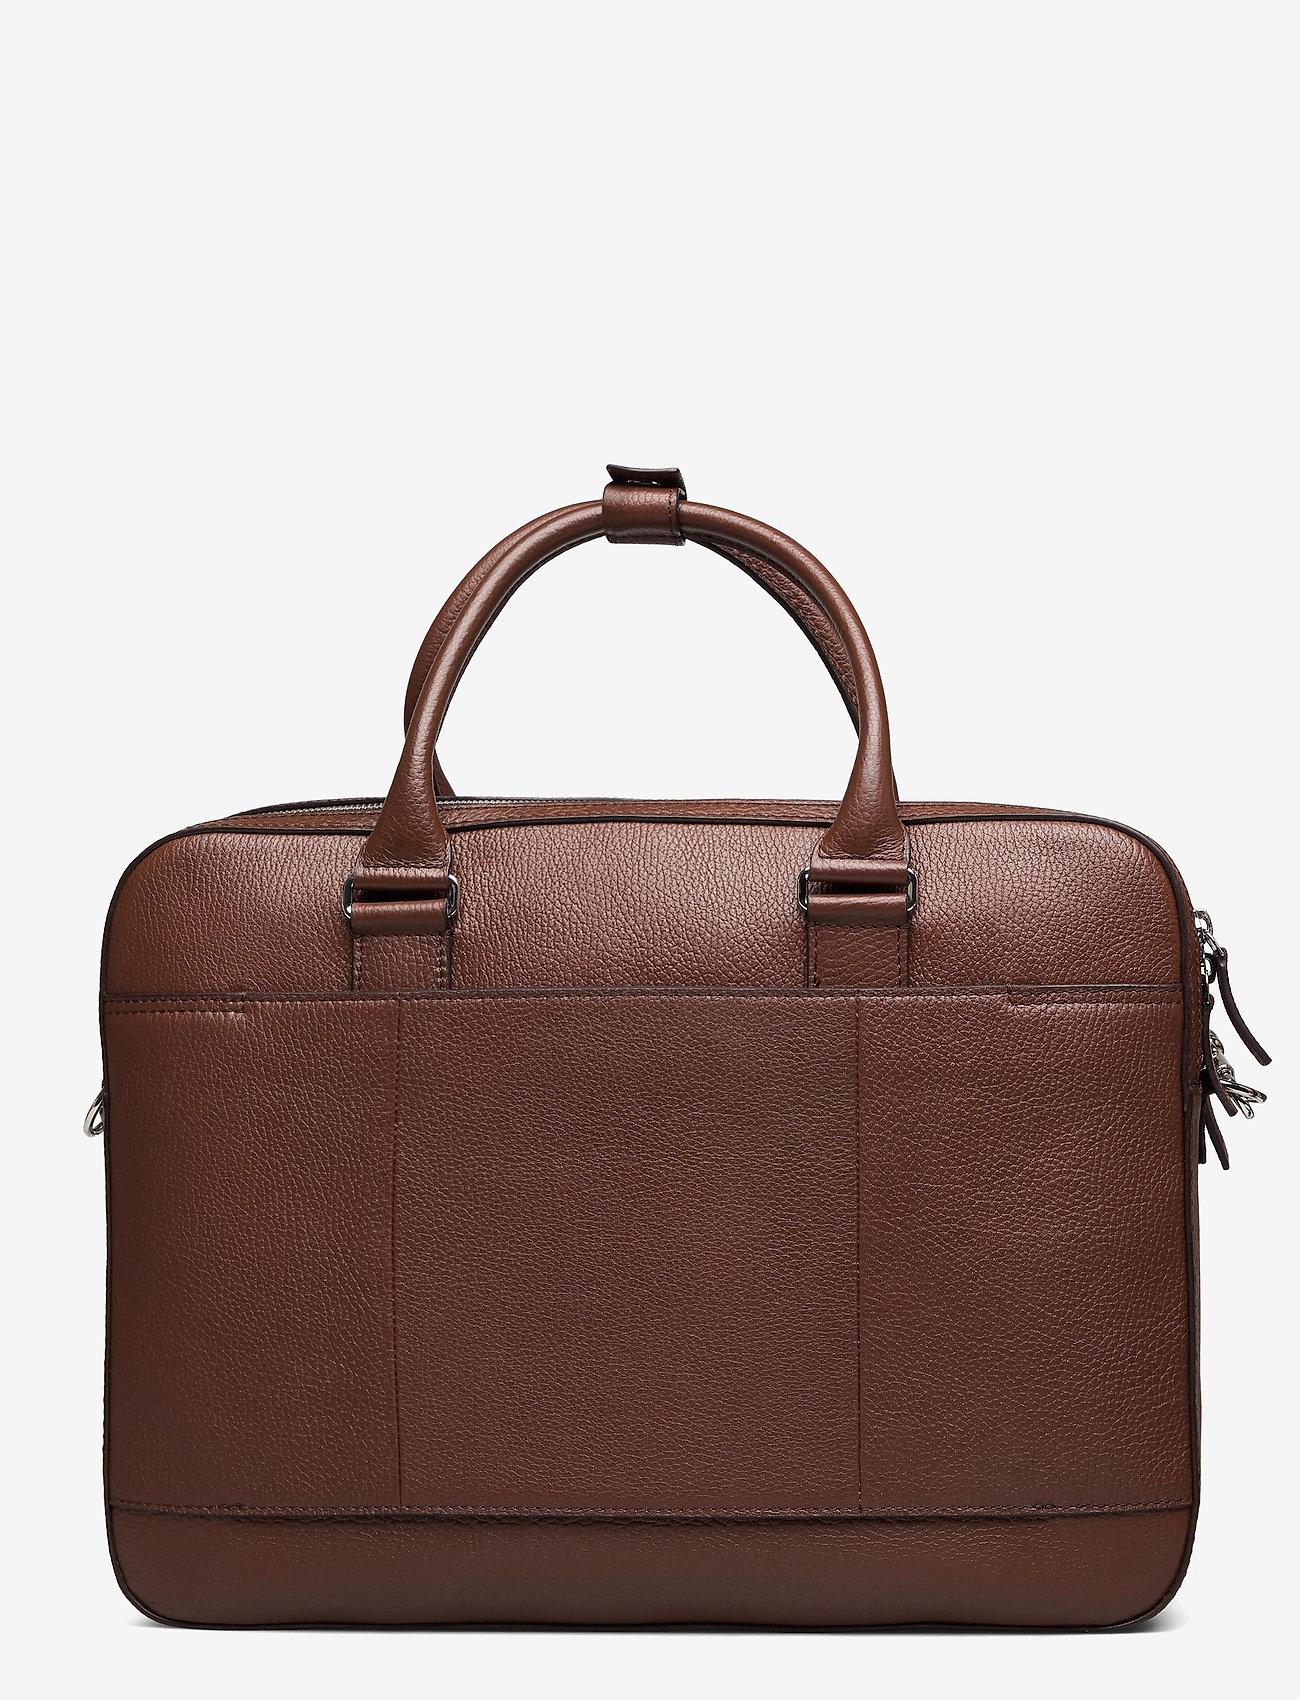 Tiger of Sweden - BURIN - briefcases - cognac - 1